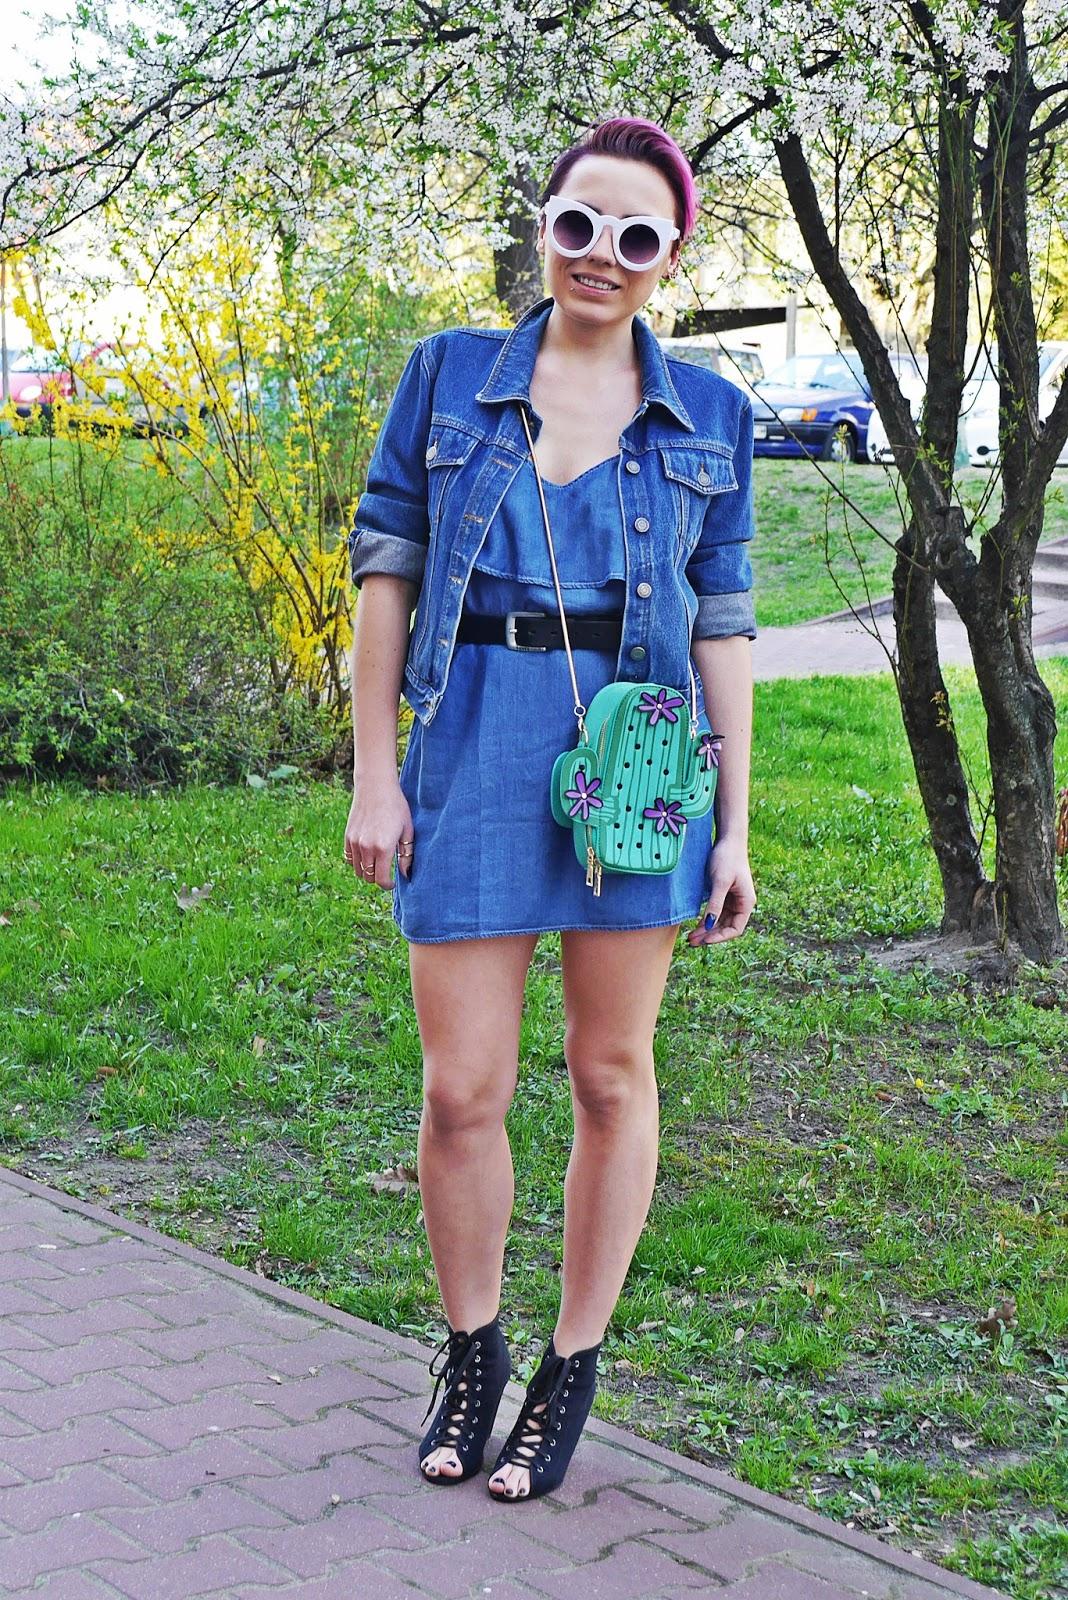 jeansowa_sukienka_torebka_kaktus_biale_okulary_koty_karyn_blog_120417